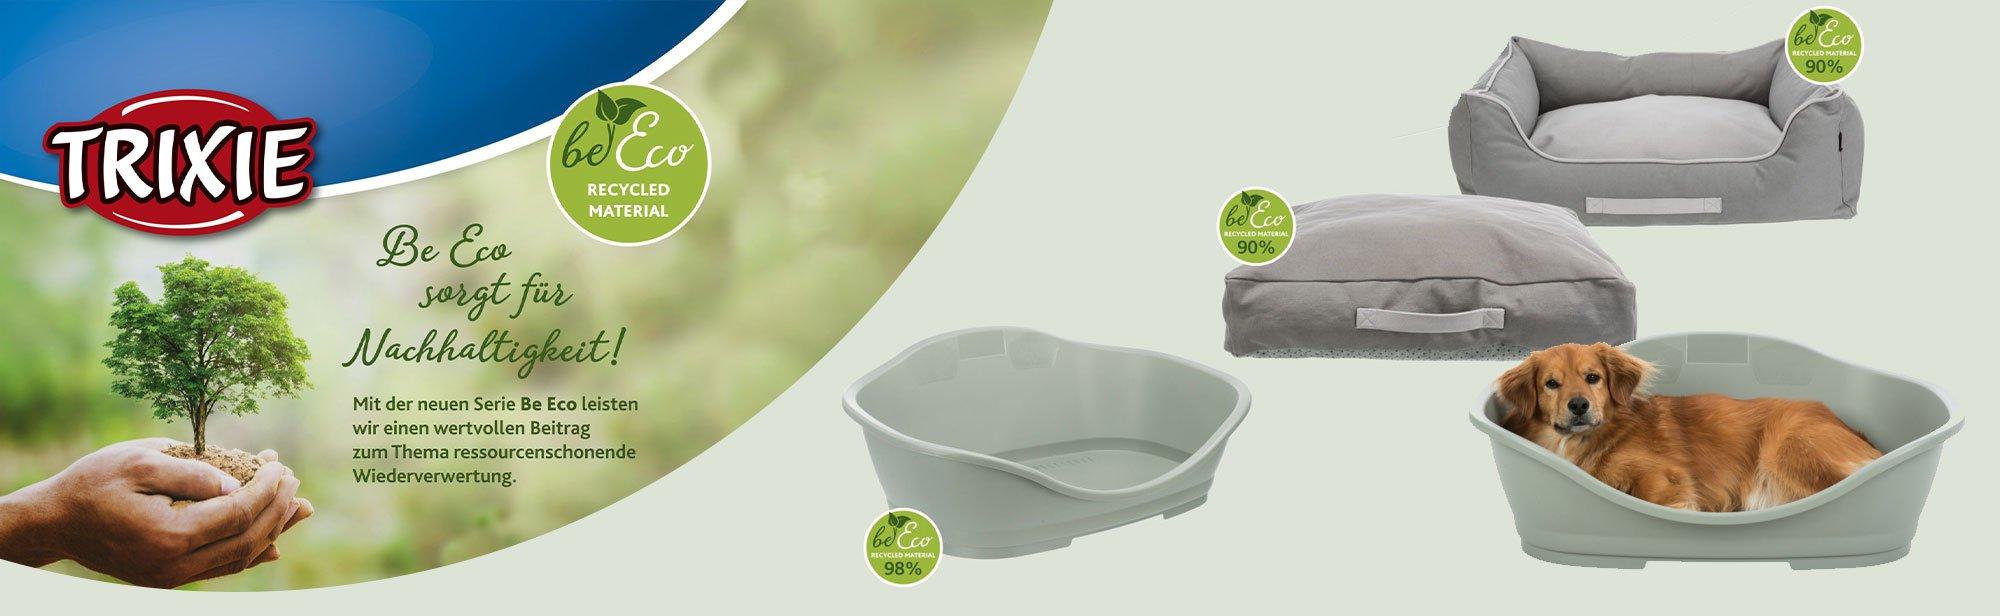 TRIXIE Be Eco - die nachhaltige Produktserie